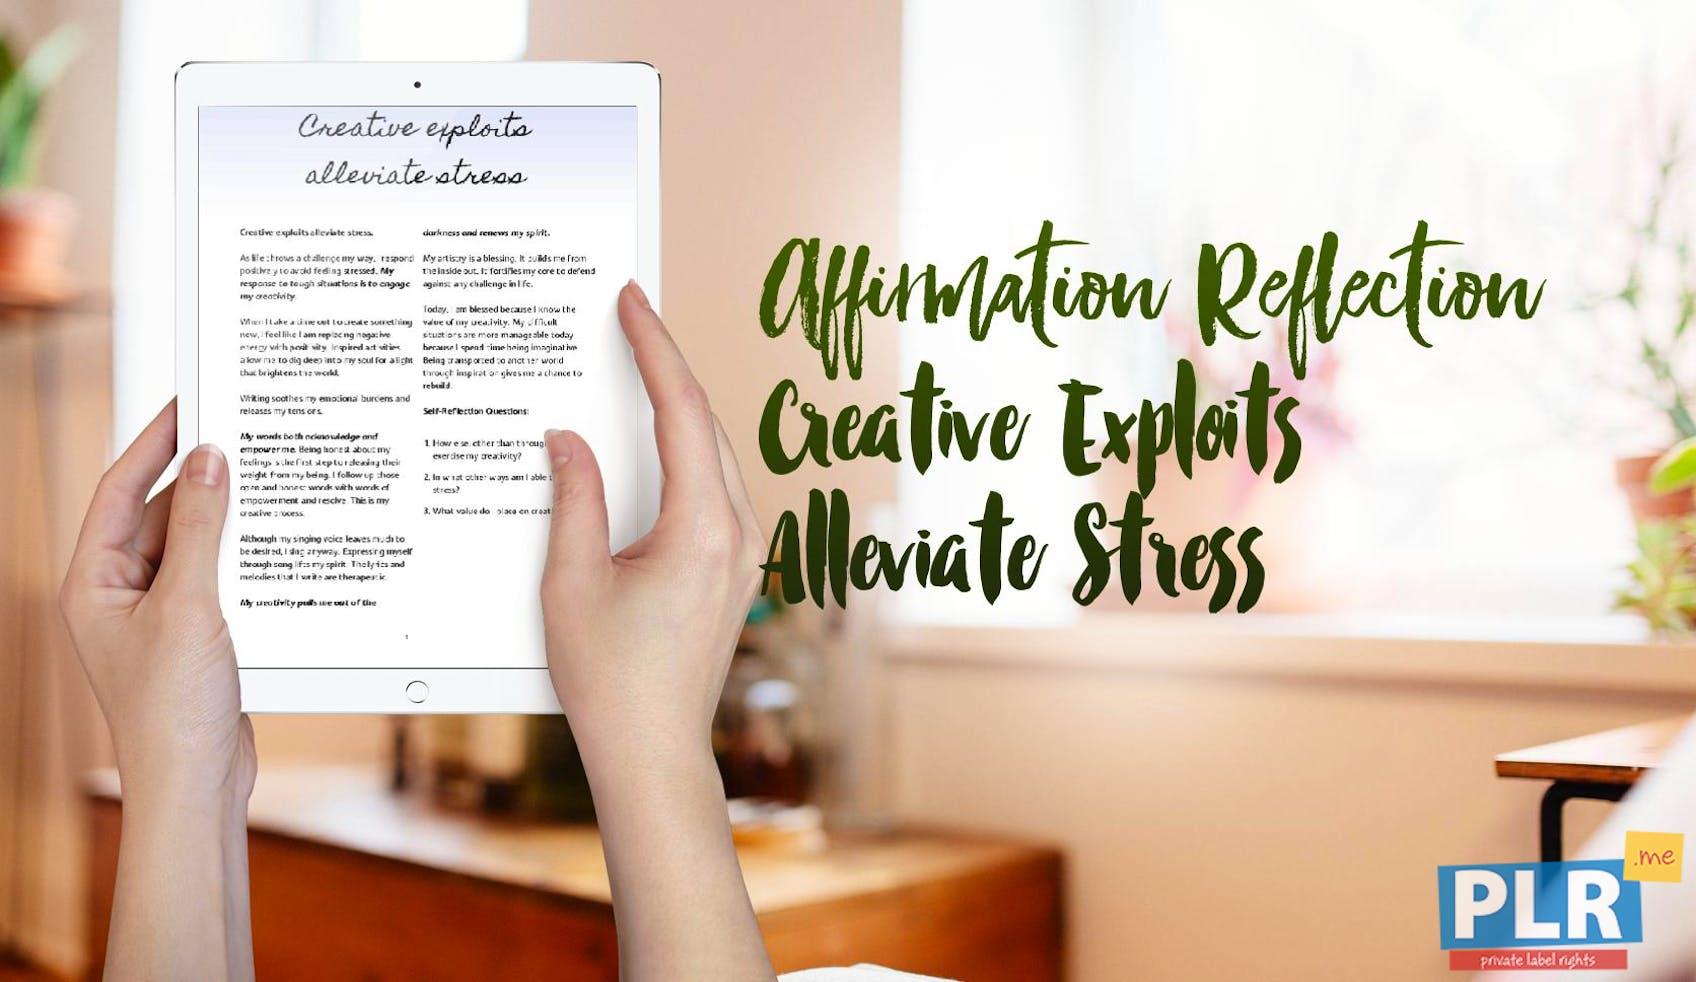 Creative Exploits Alleviate Stress